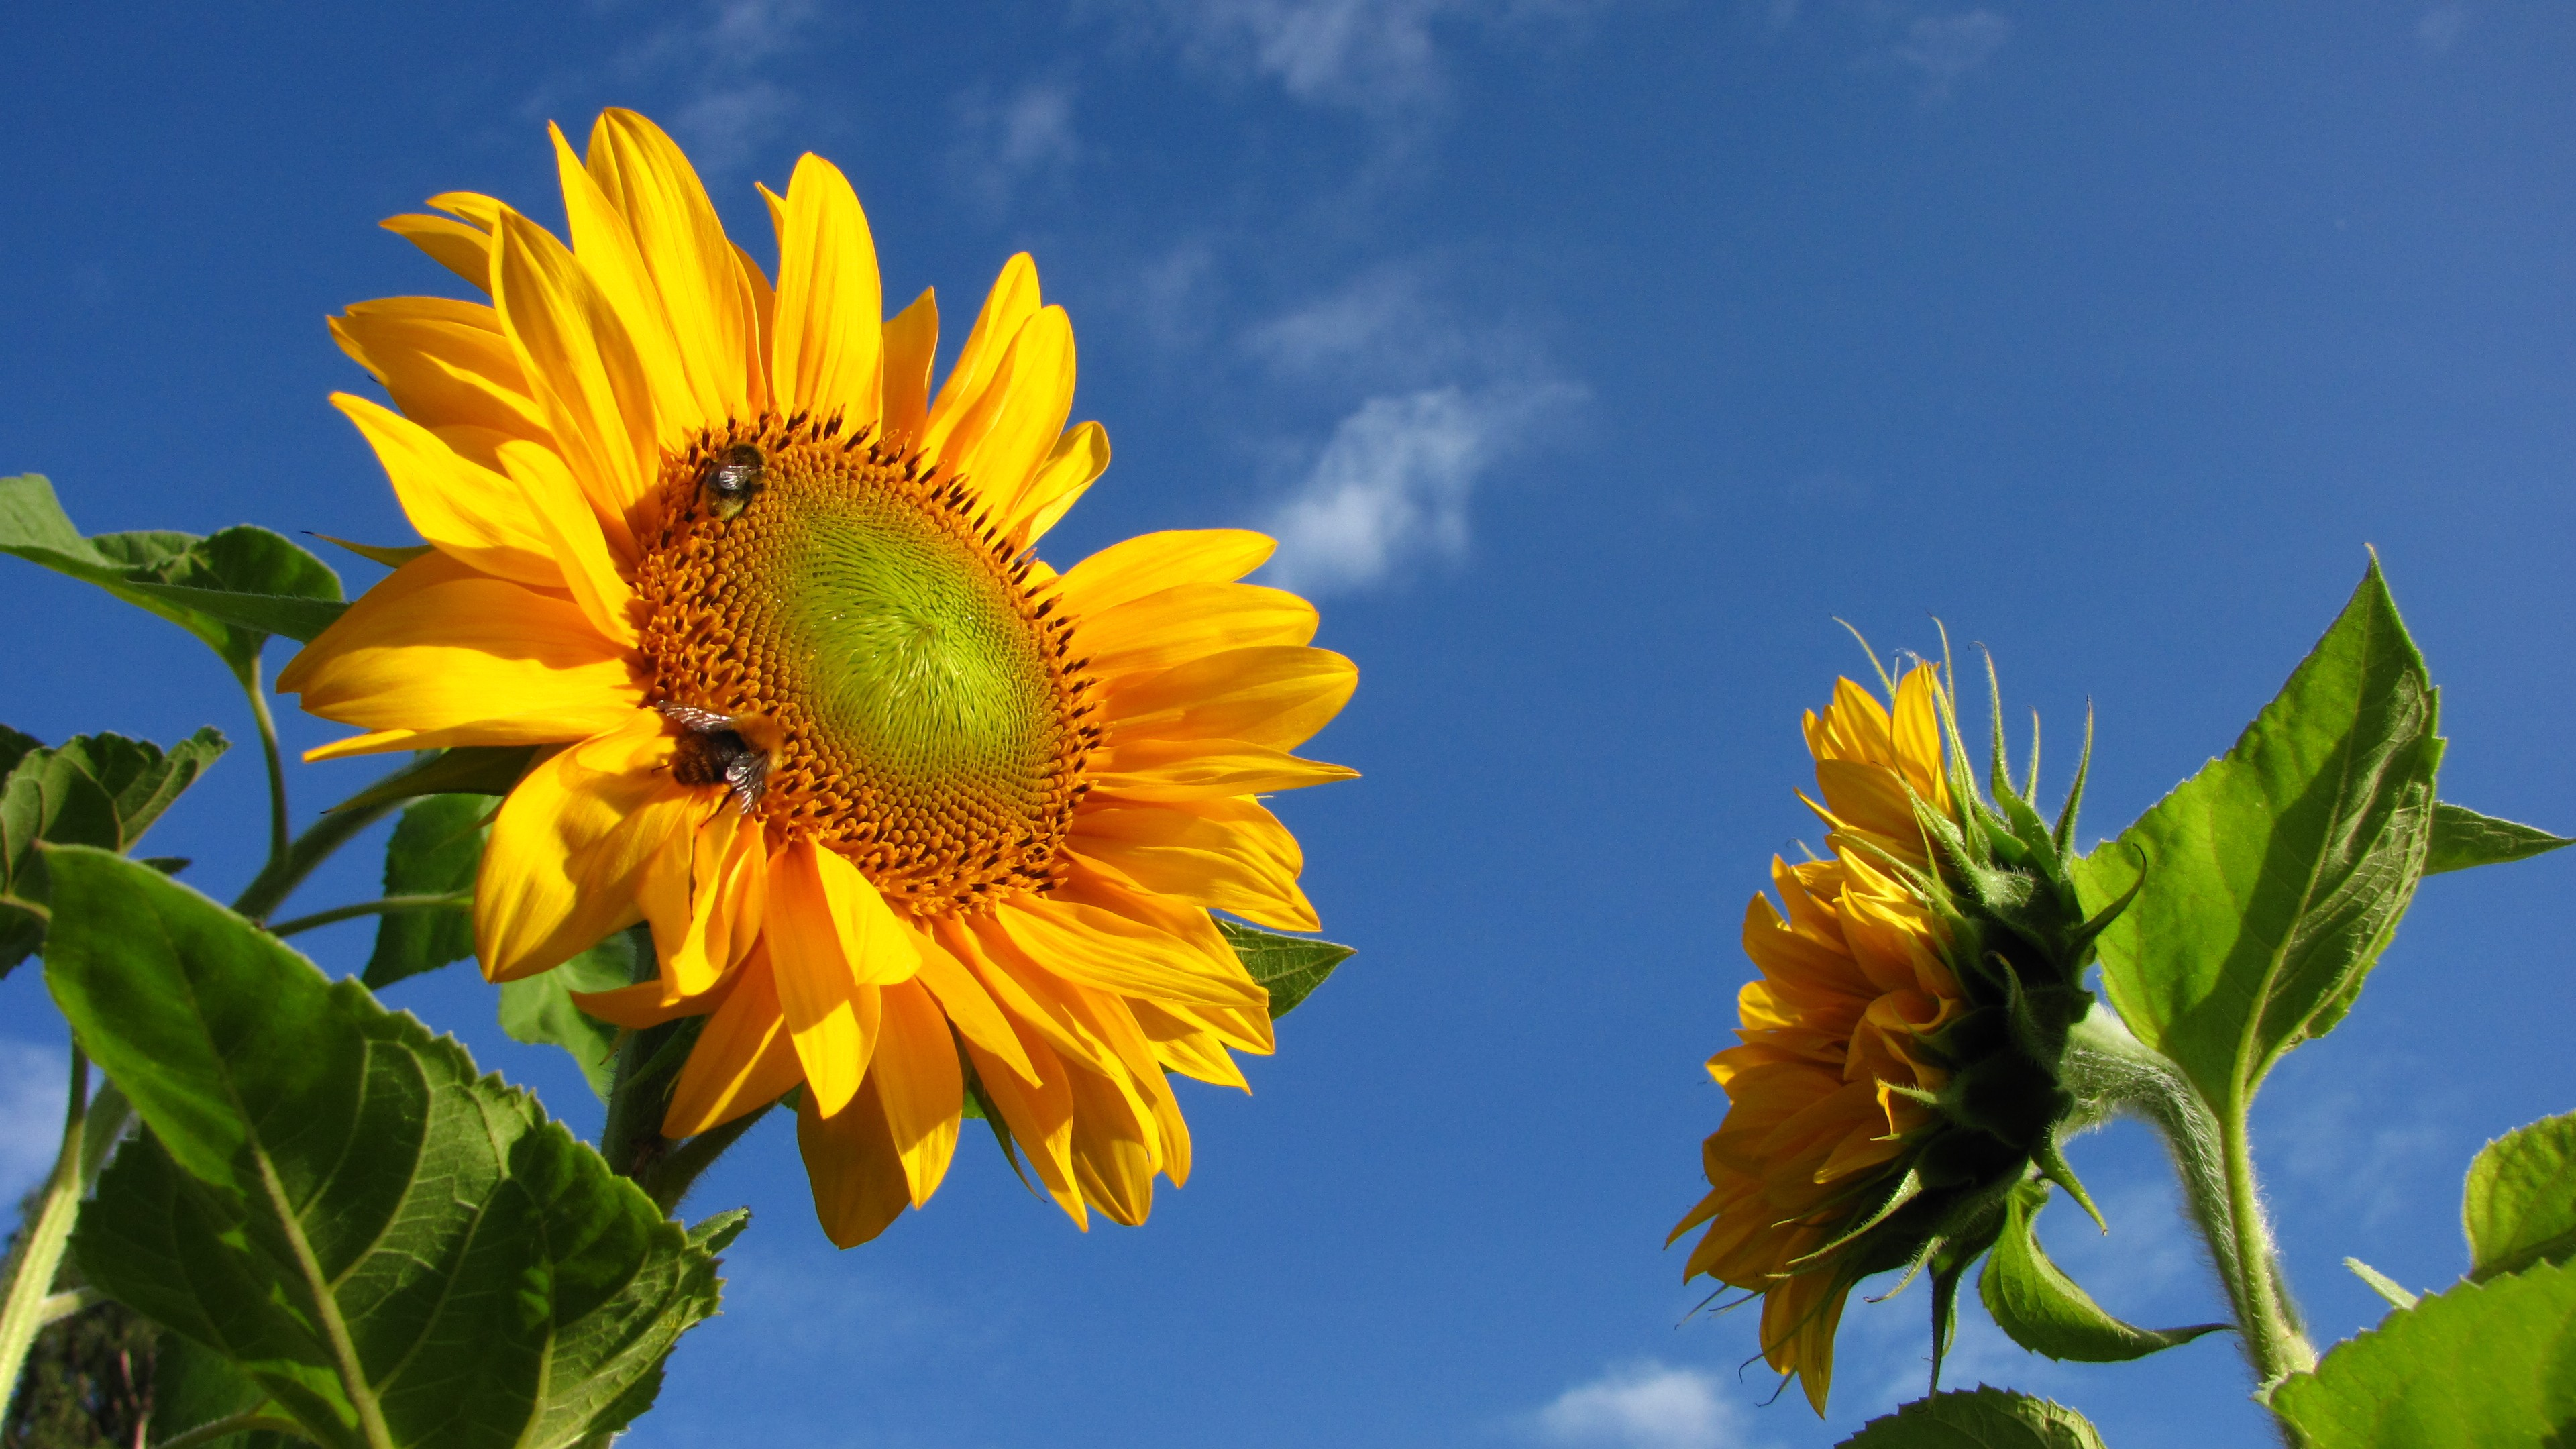 sunflower fields tumblr